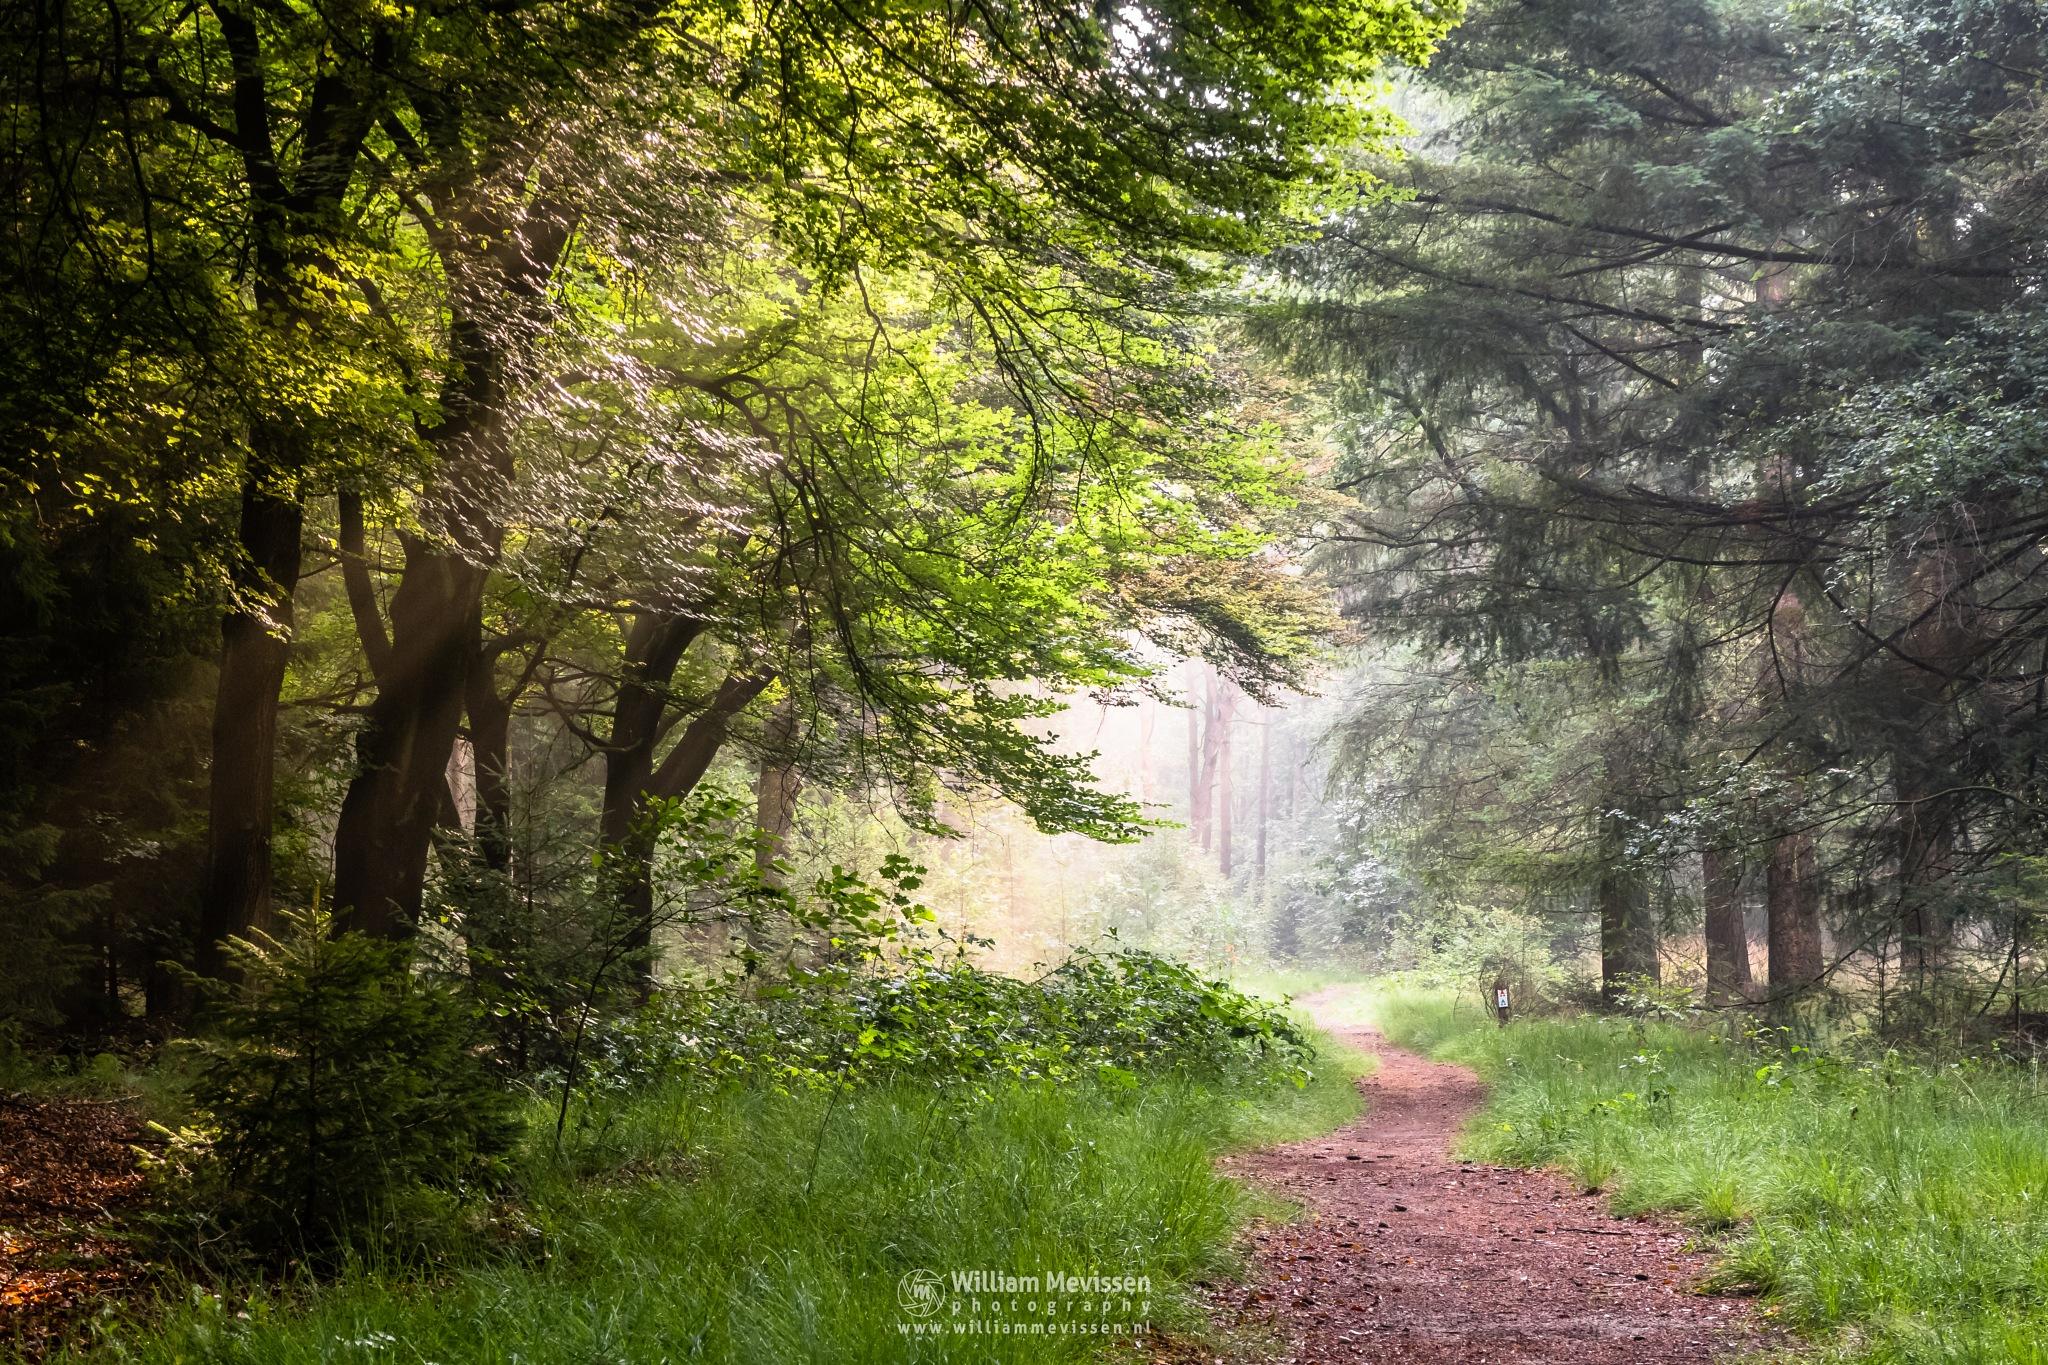 Into The Light by William Mevissen